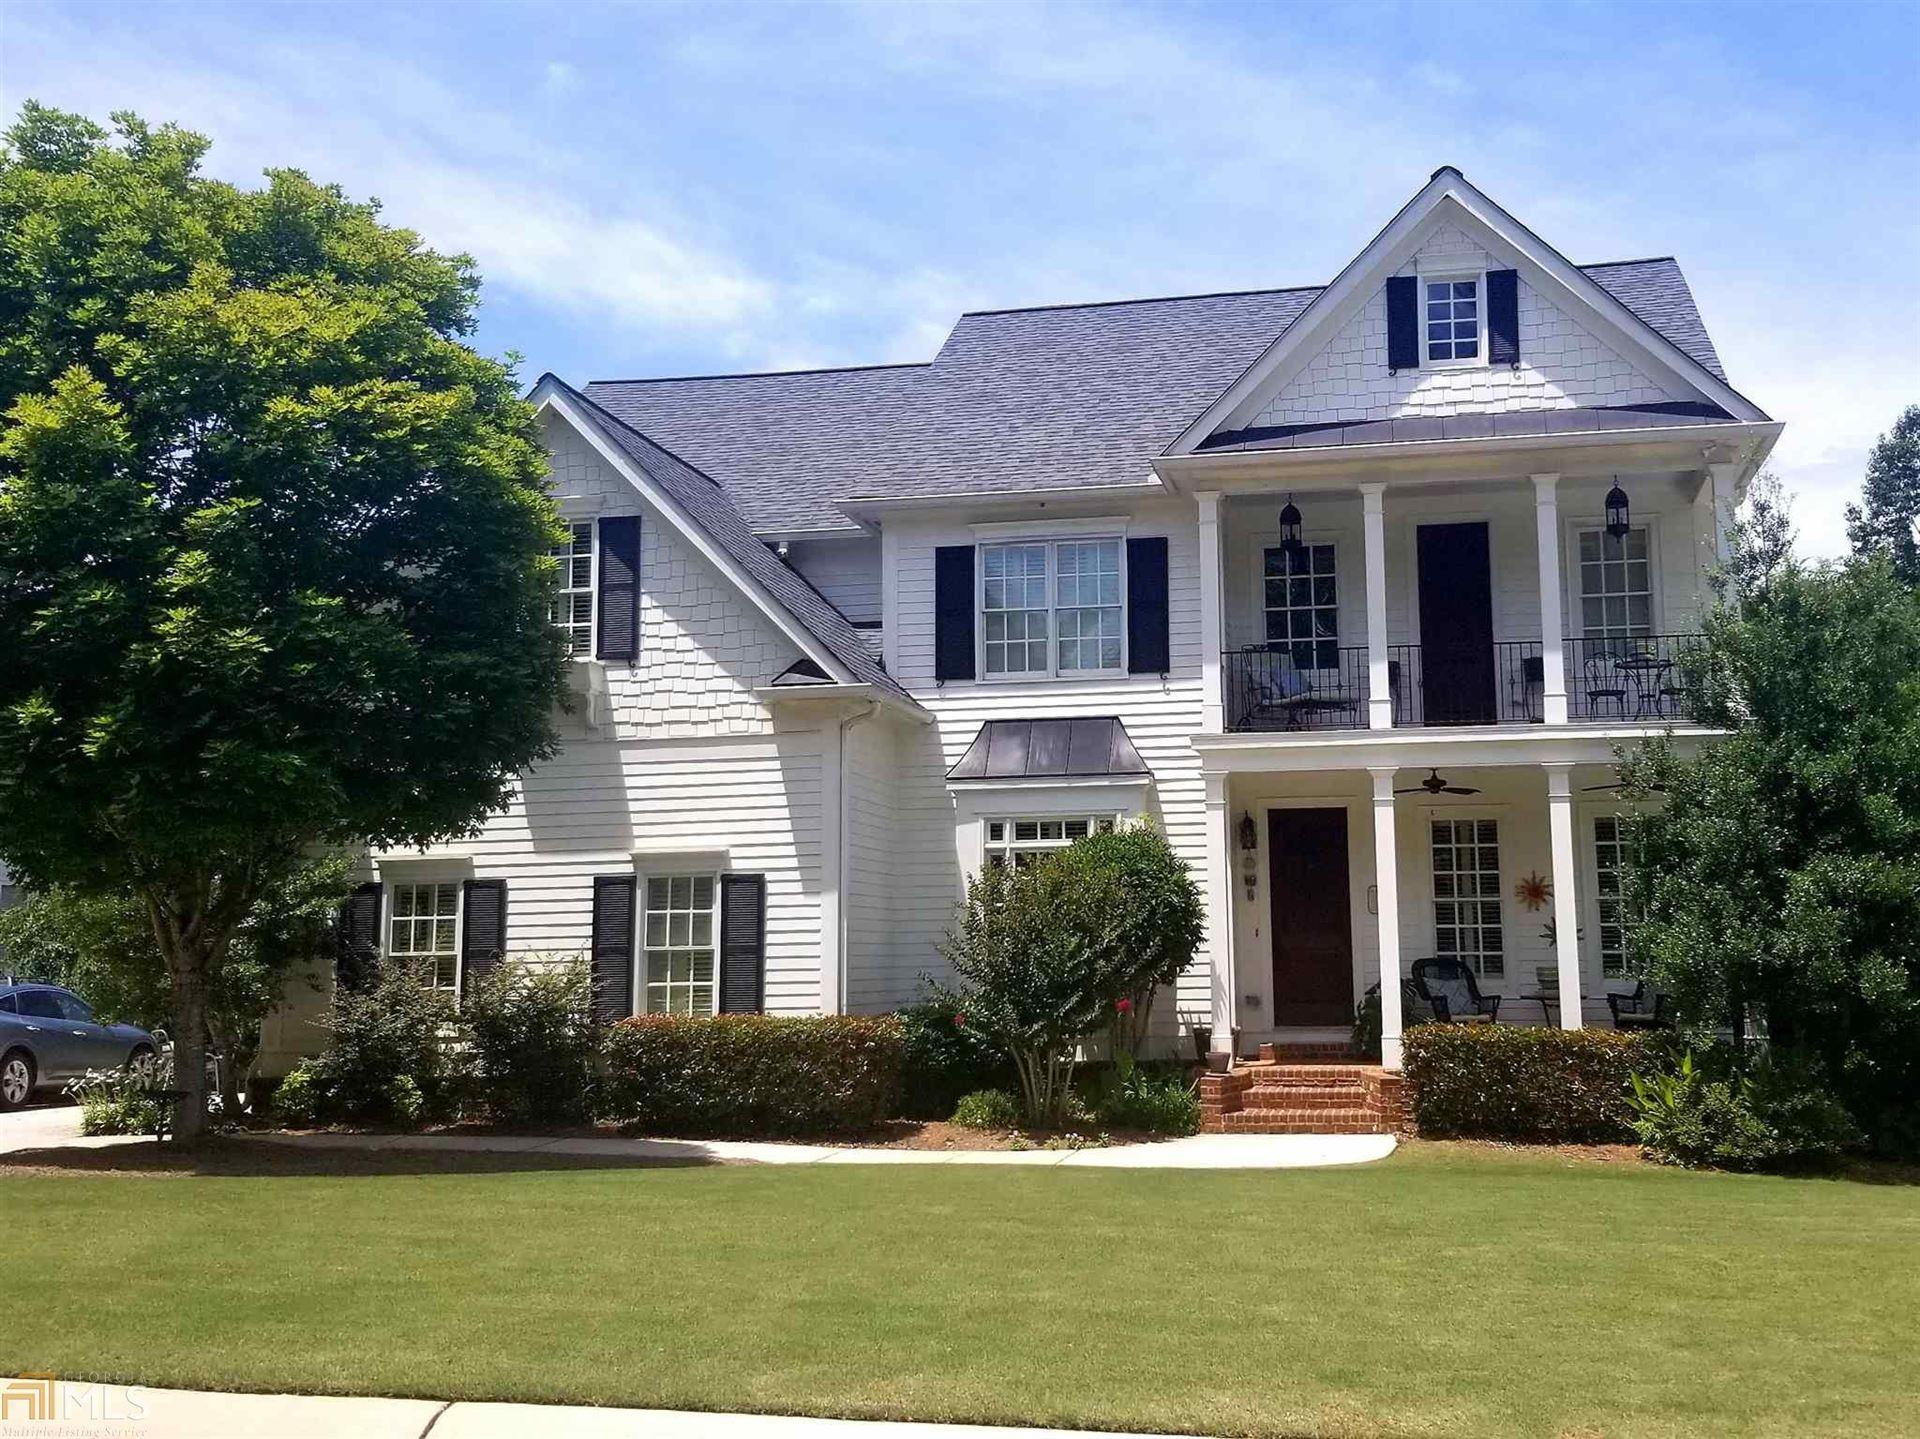 2201 N Pear Grove Ct, Jefferson, GA 30549 - MLS#: 8886584